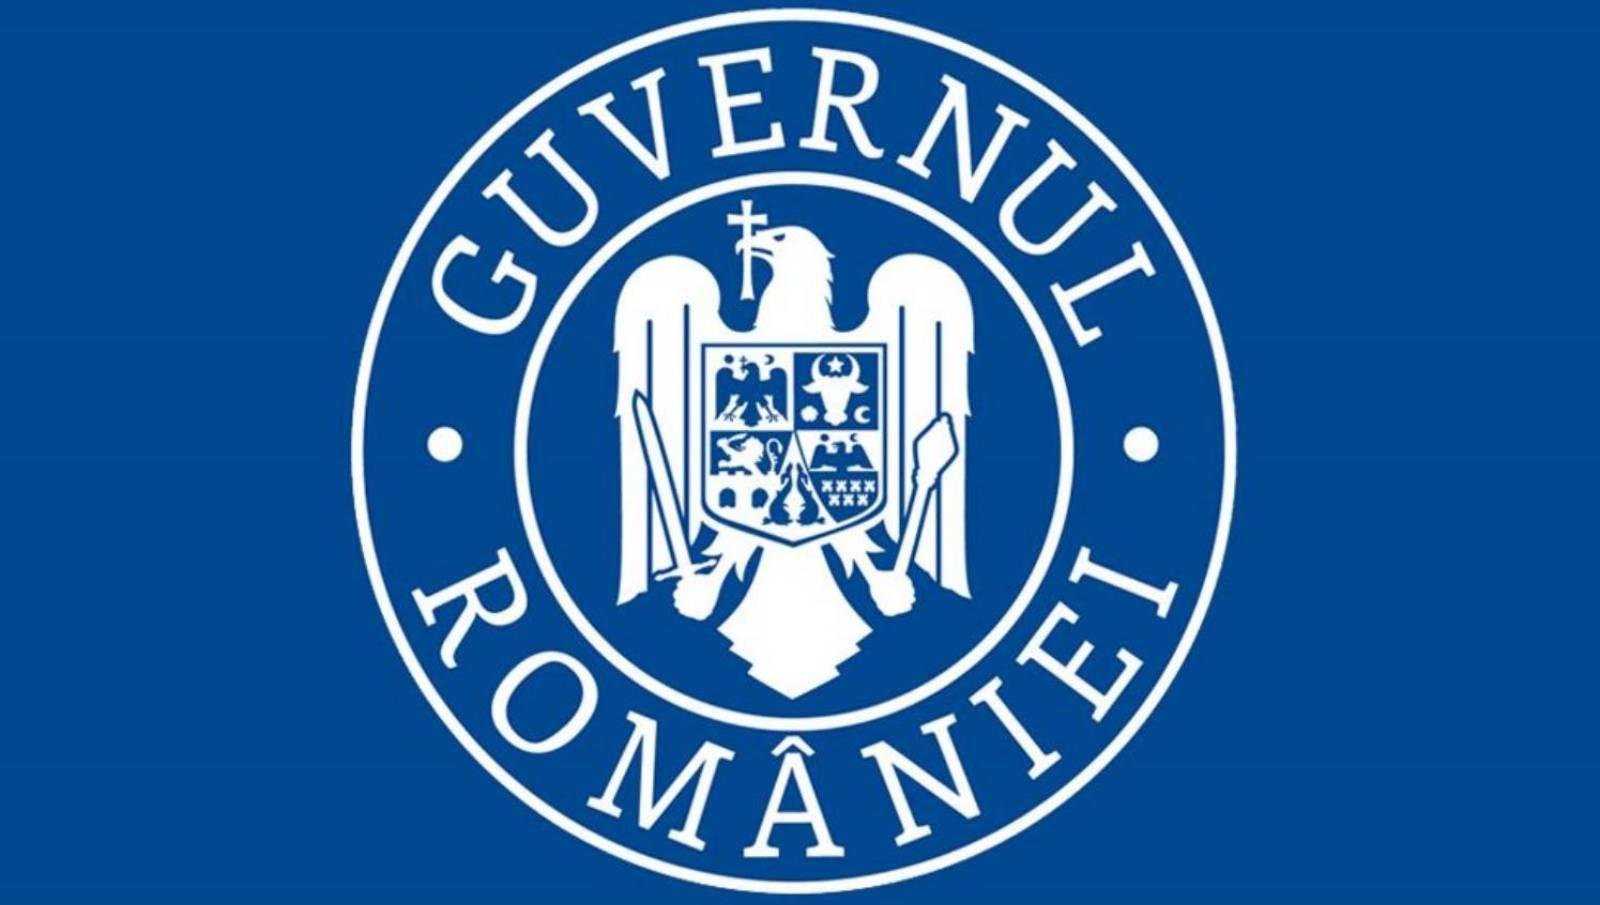 Guvernul Romaniei mesaj oamenii masca